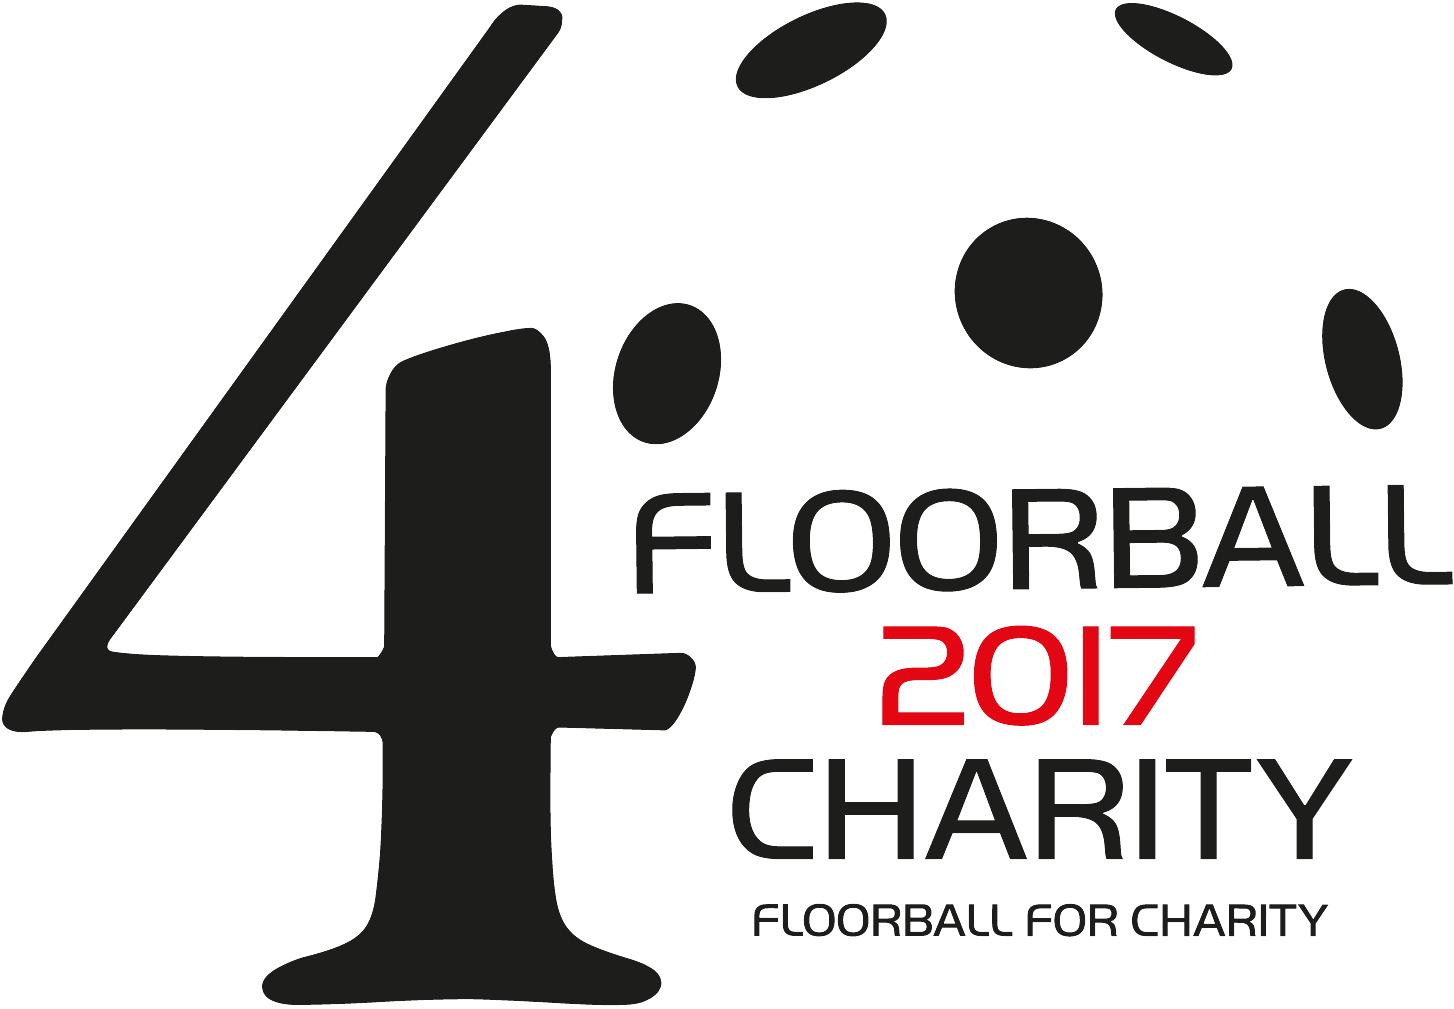 F4C Logga 2017